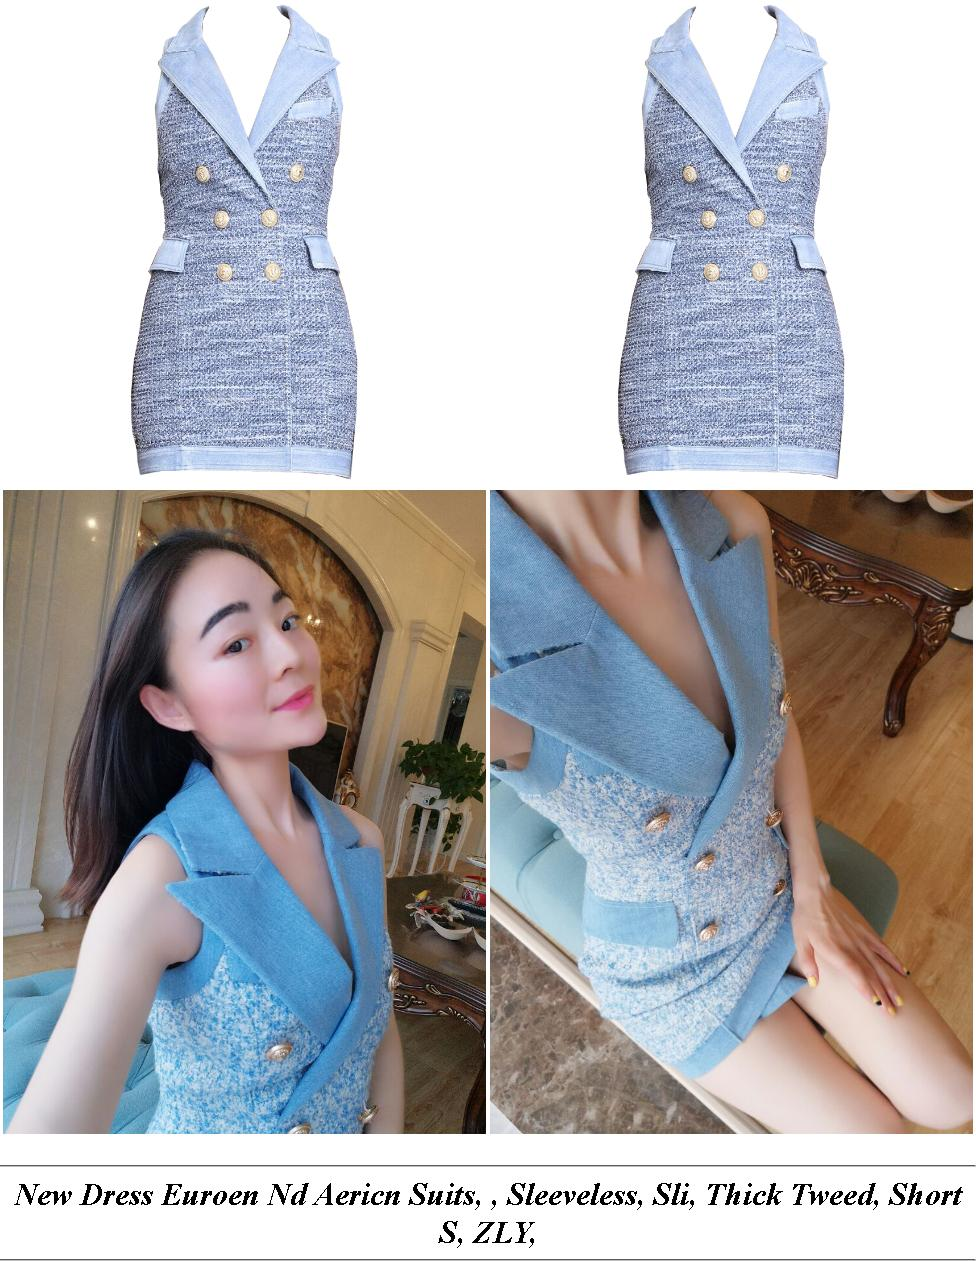 Womens Clothing Dresses - Womens Summer Dresses On Sale - Sheath Dress - Cheap Designer Clothes Womens